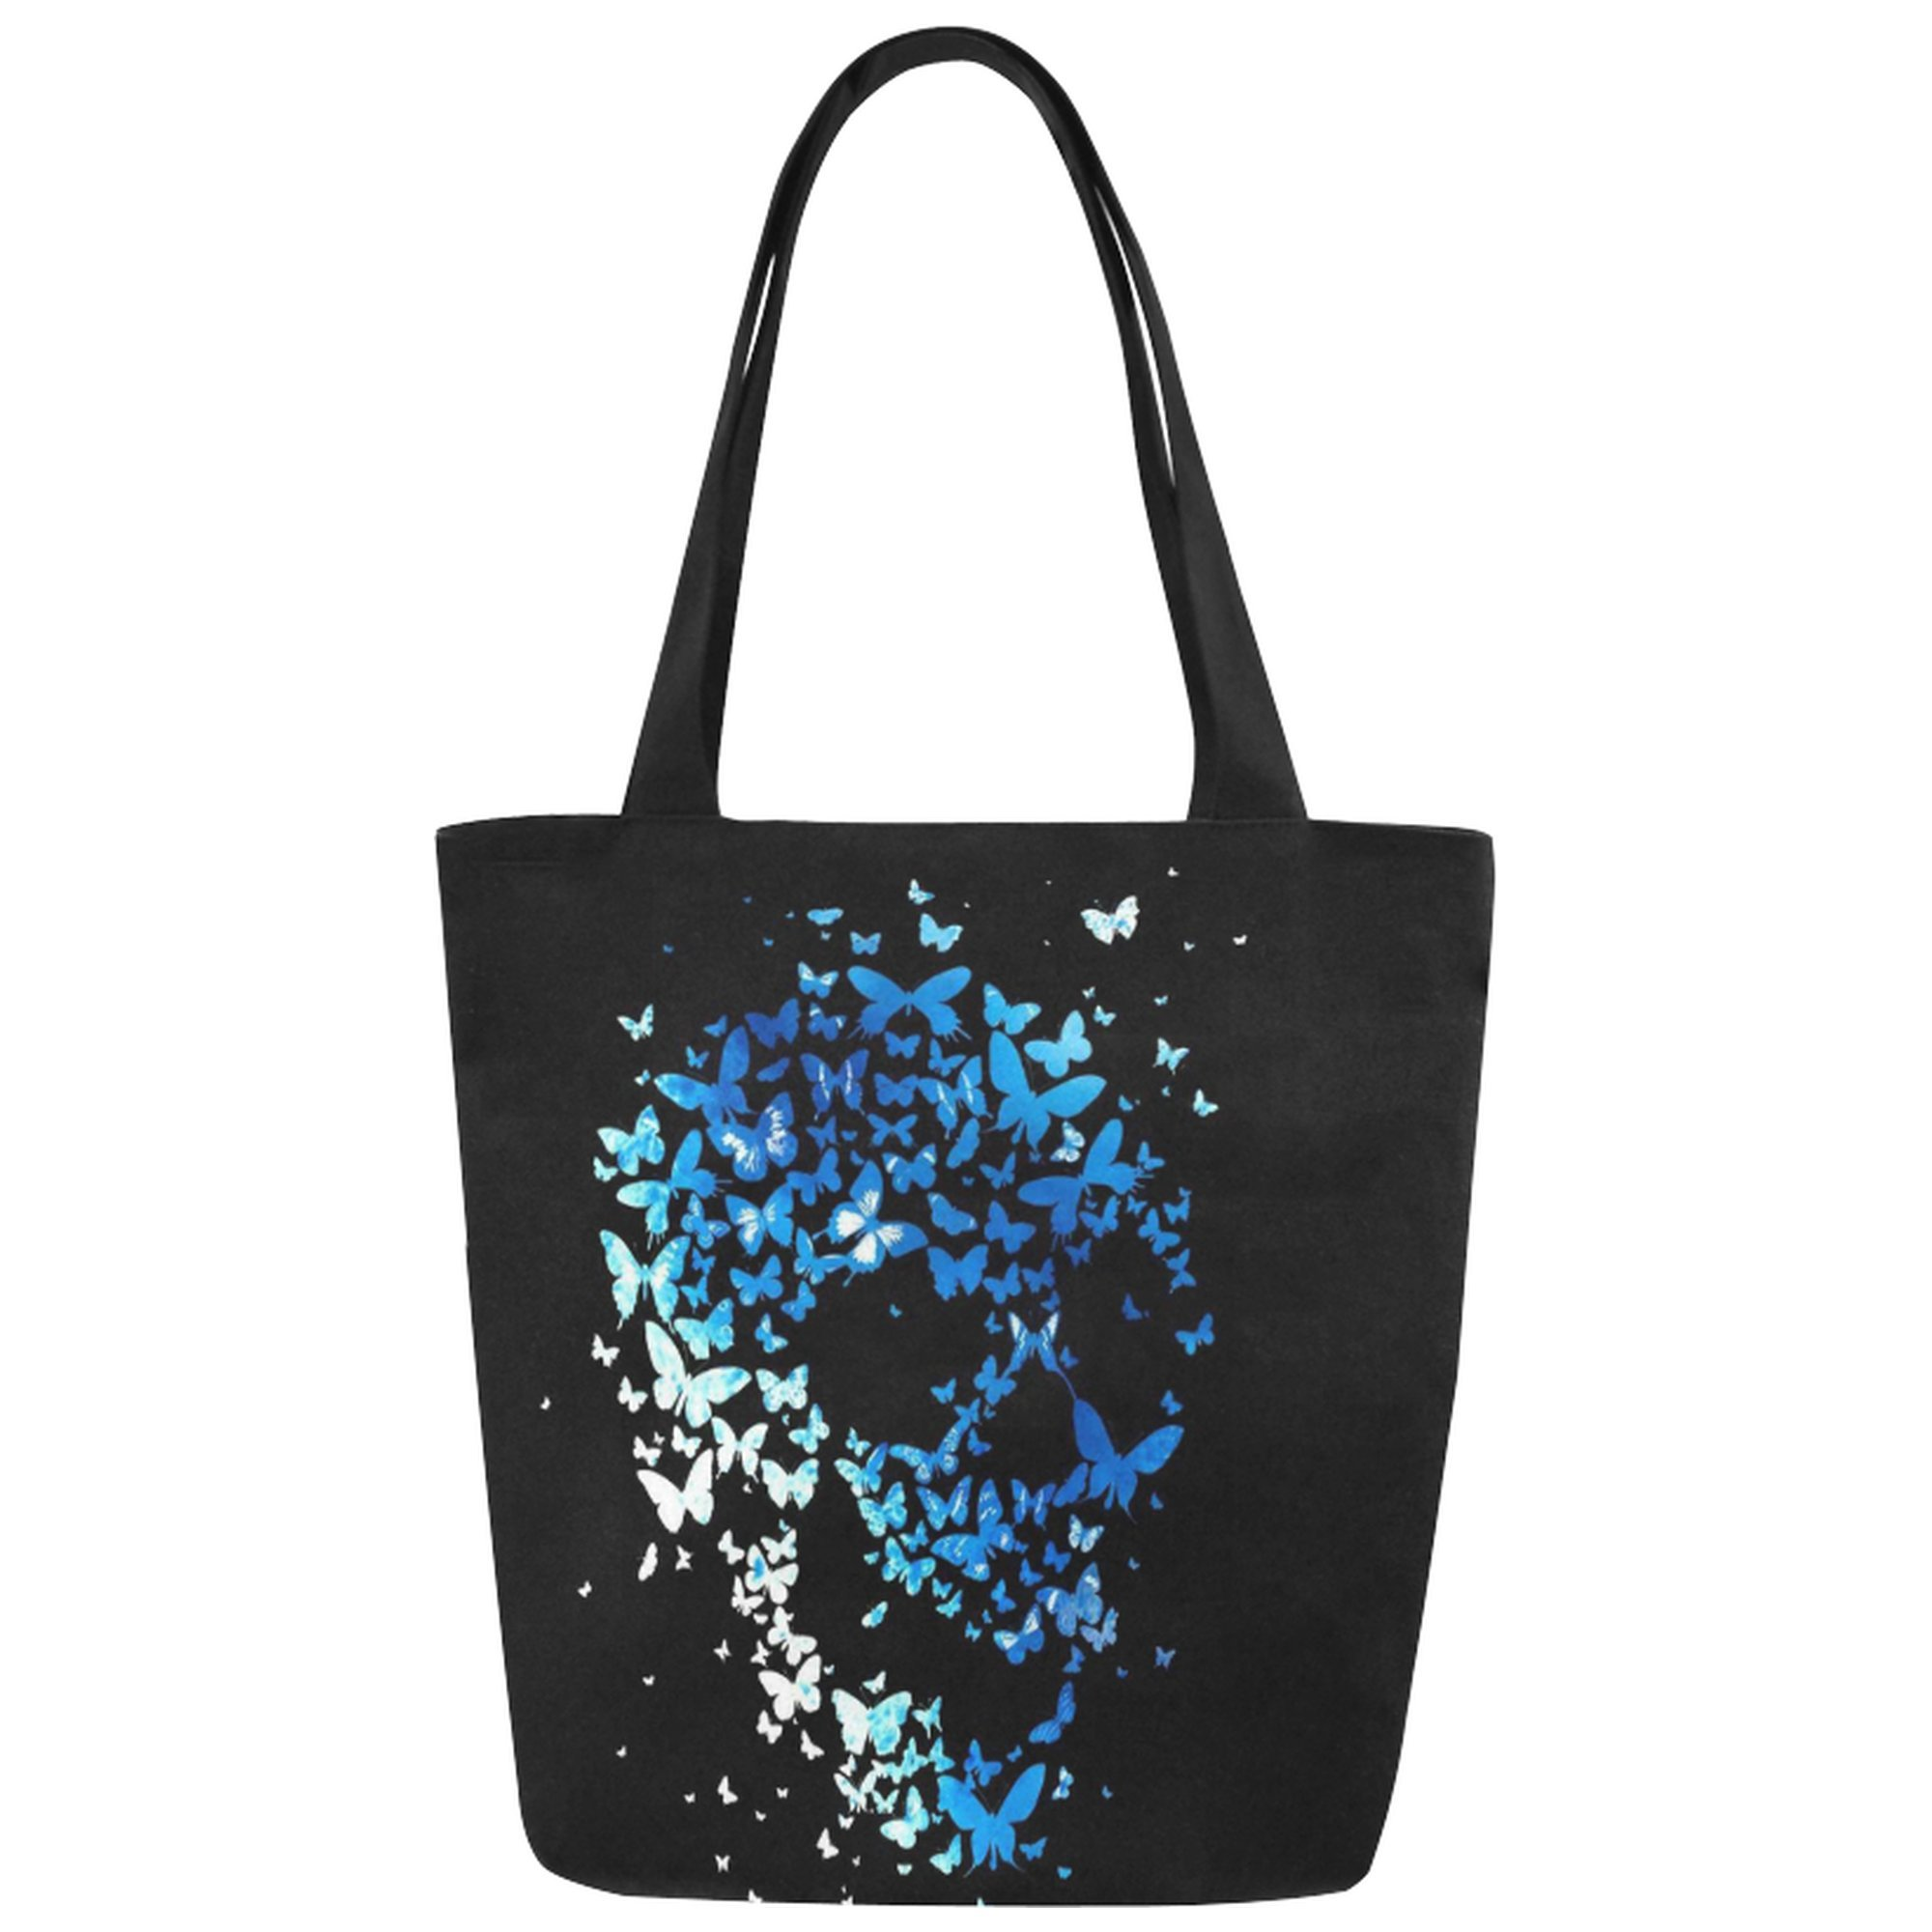 InterestPrint Blue Butterfly Skull Canvas Tote Bag Shoulder Handbag for Women Girls